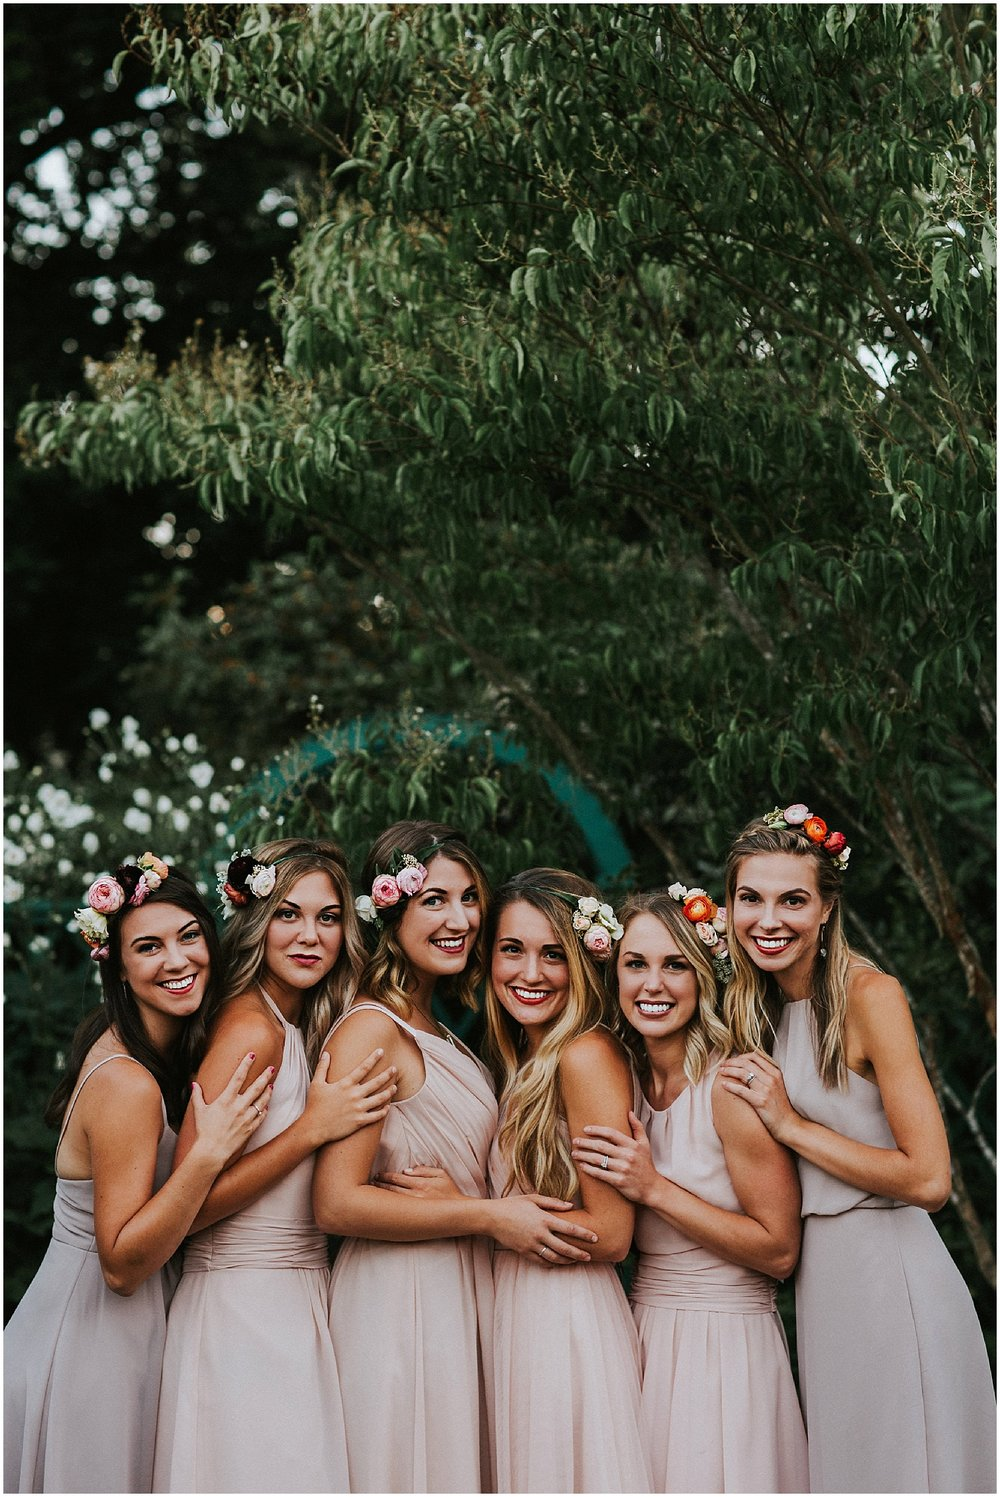 flower crowns on bridesmaids